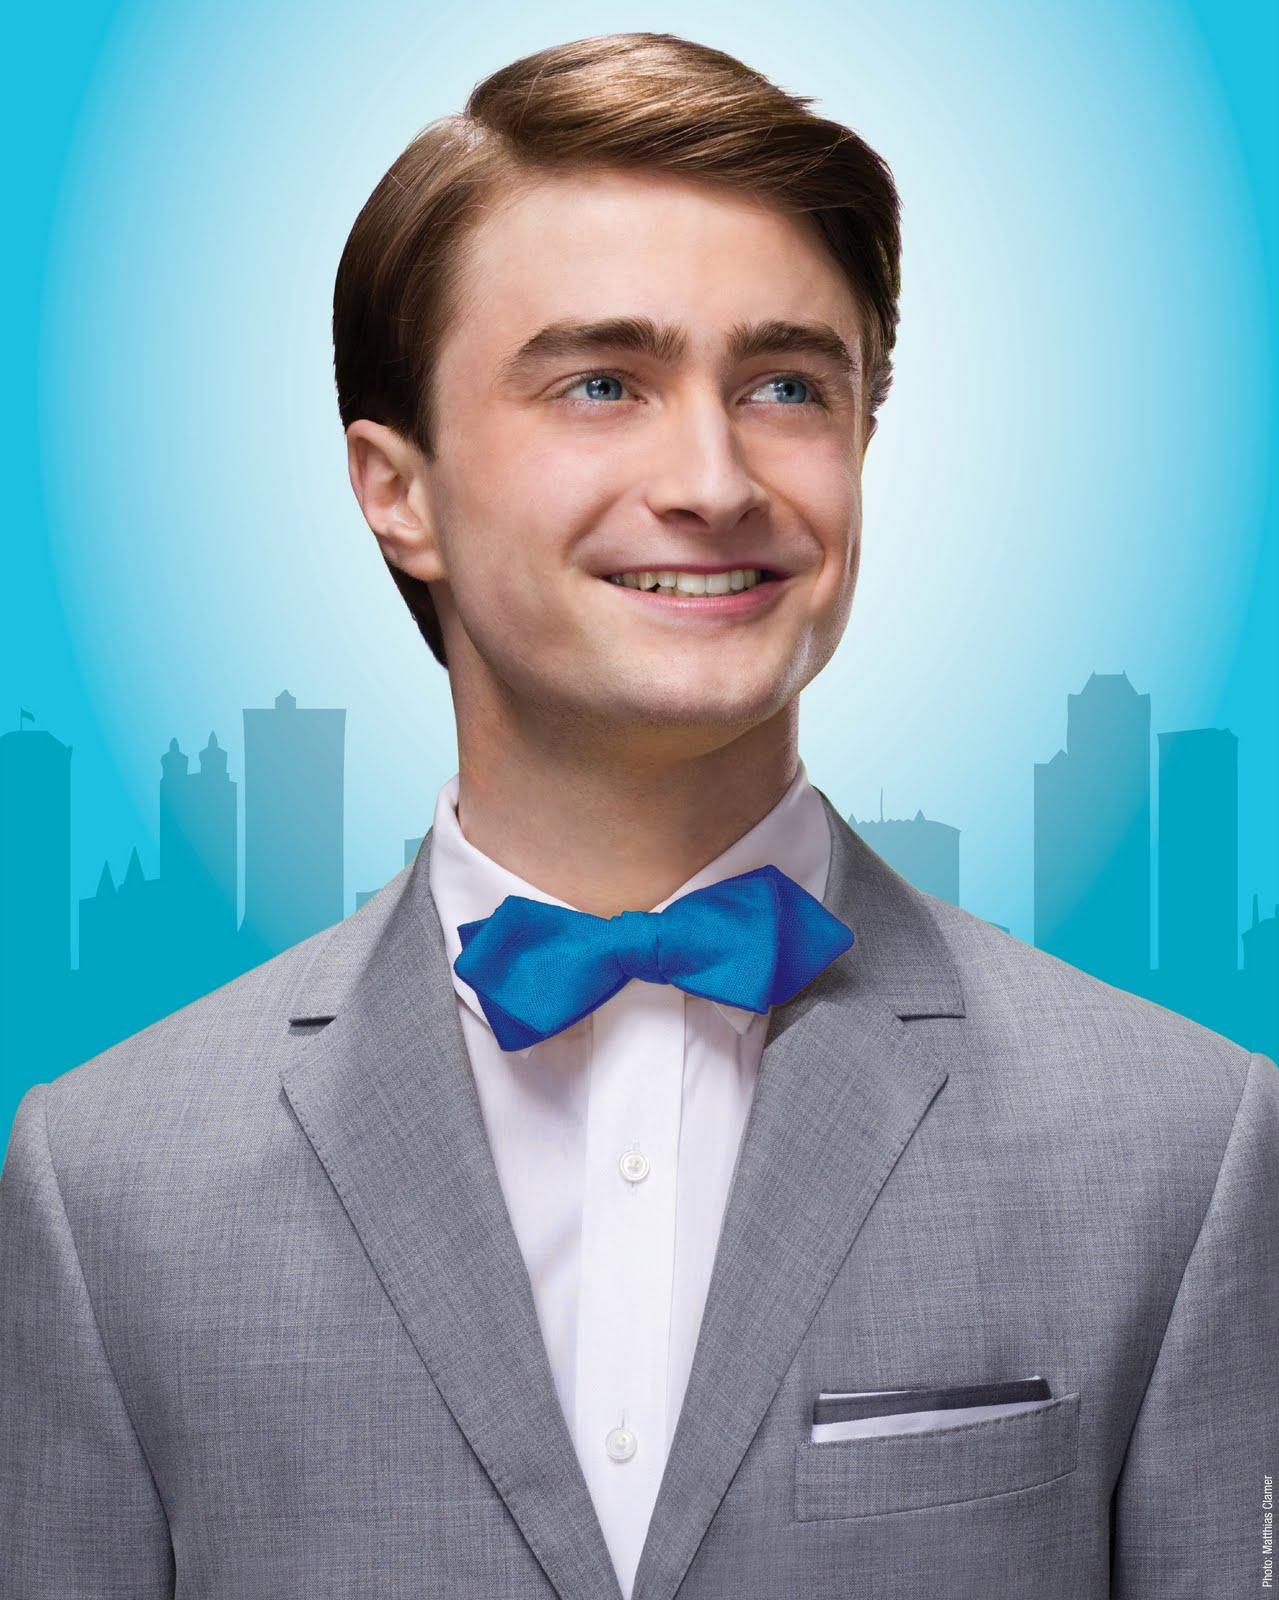 Daniel Radcliffe (born 1989)